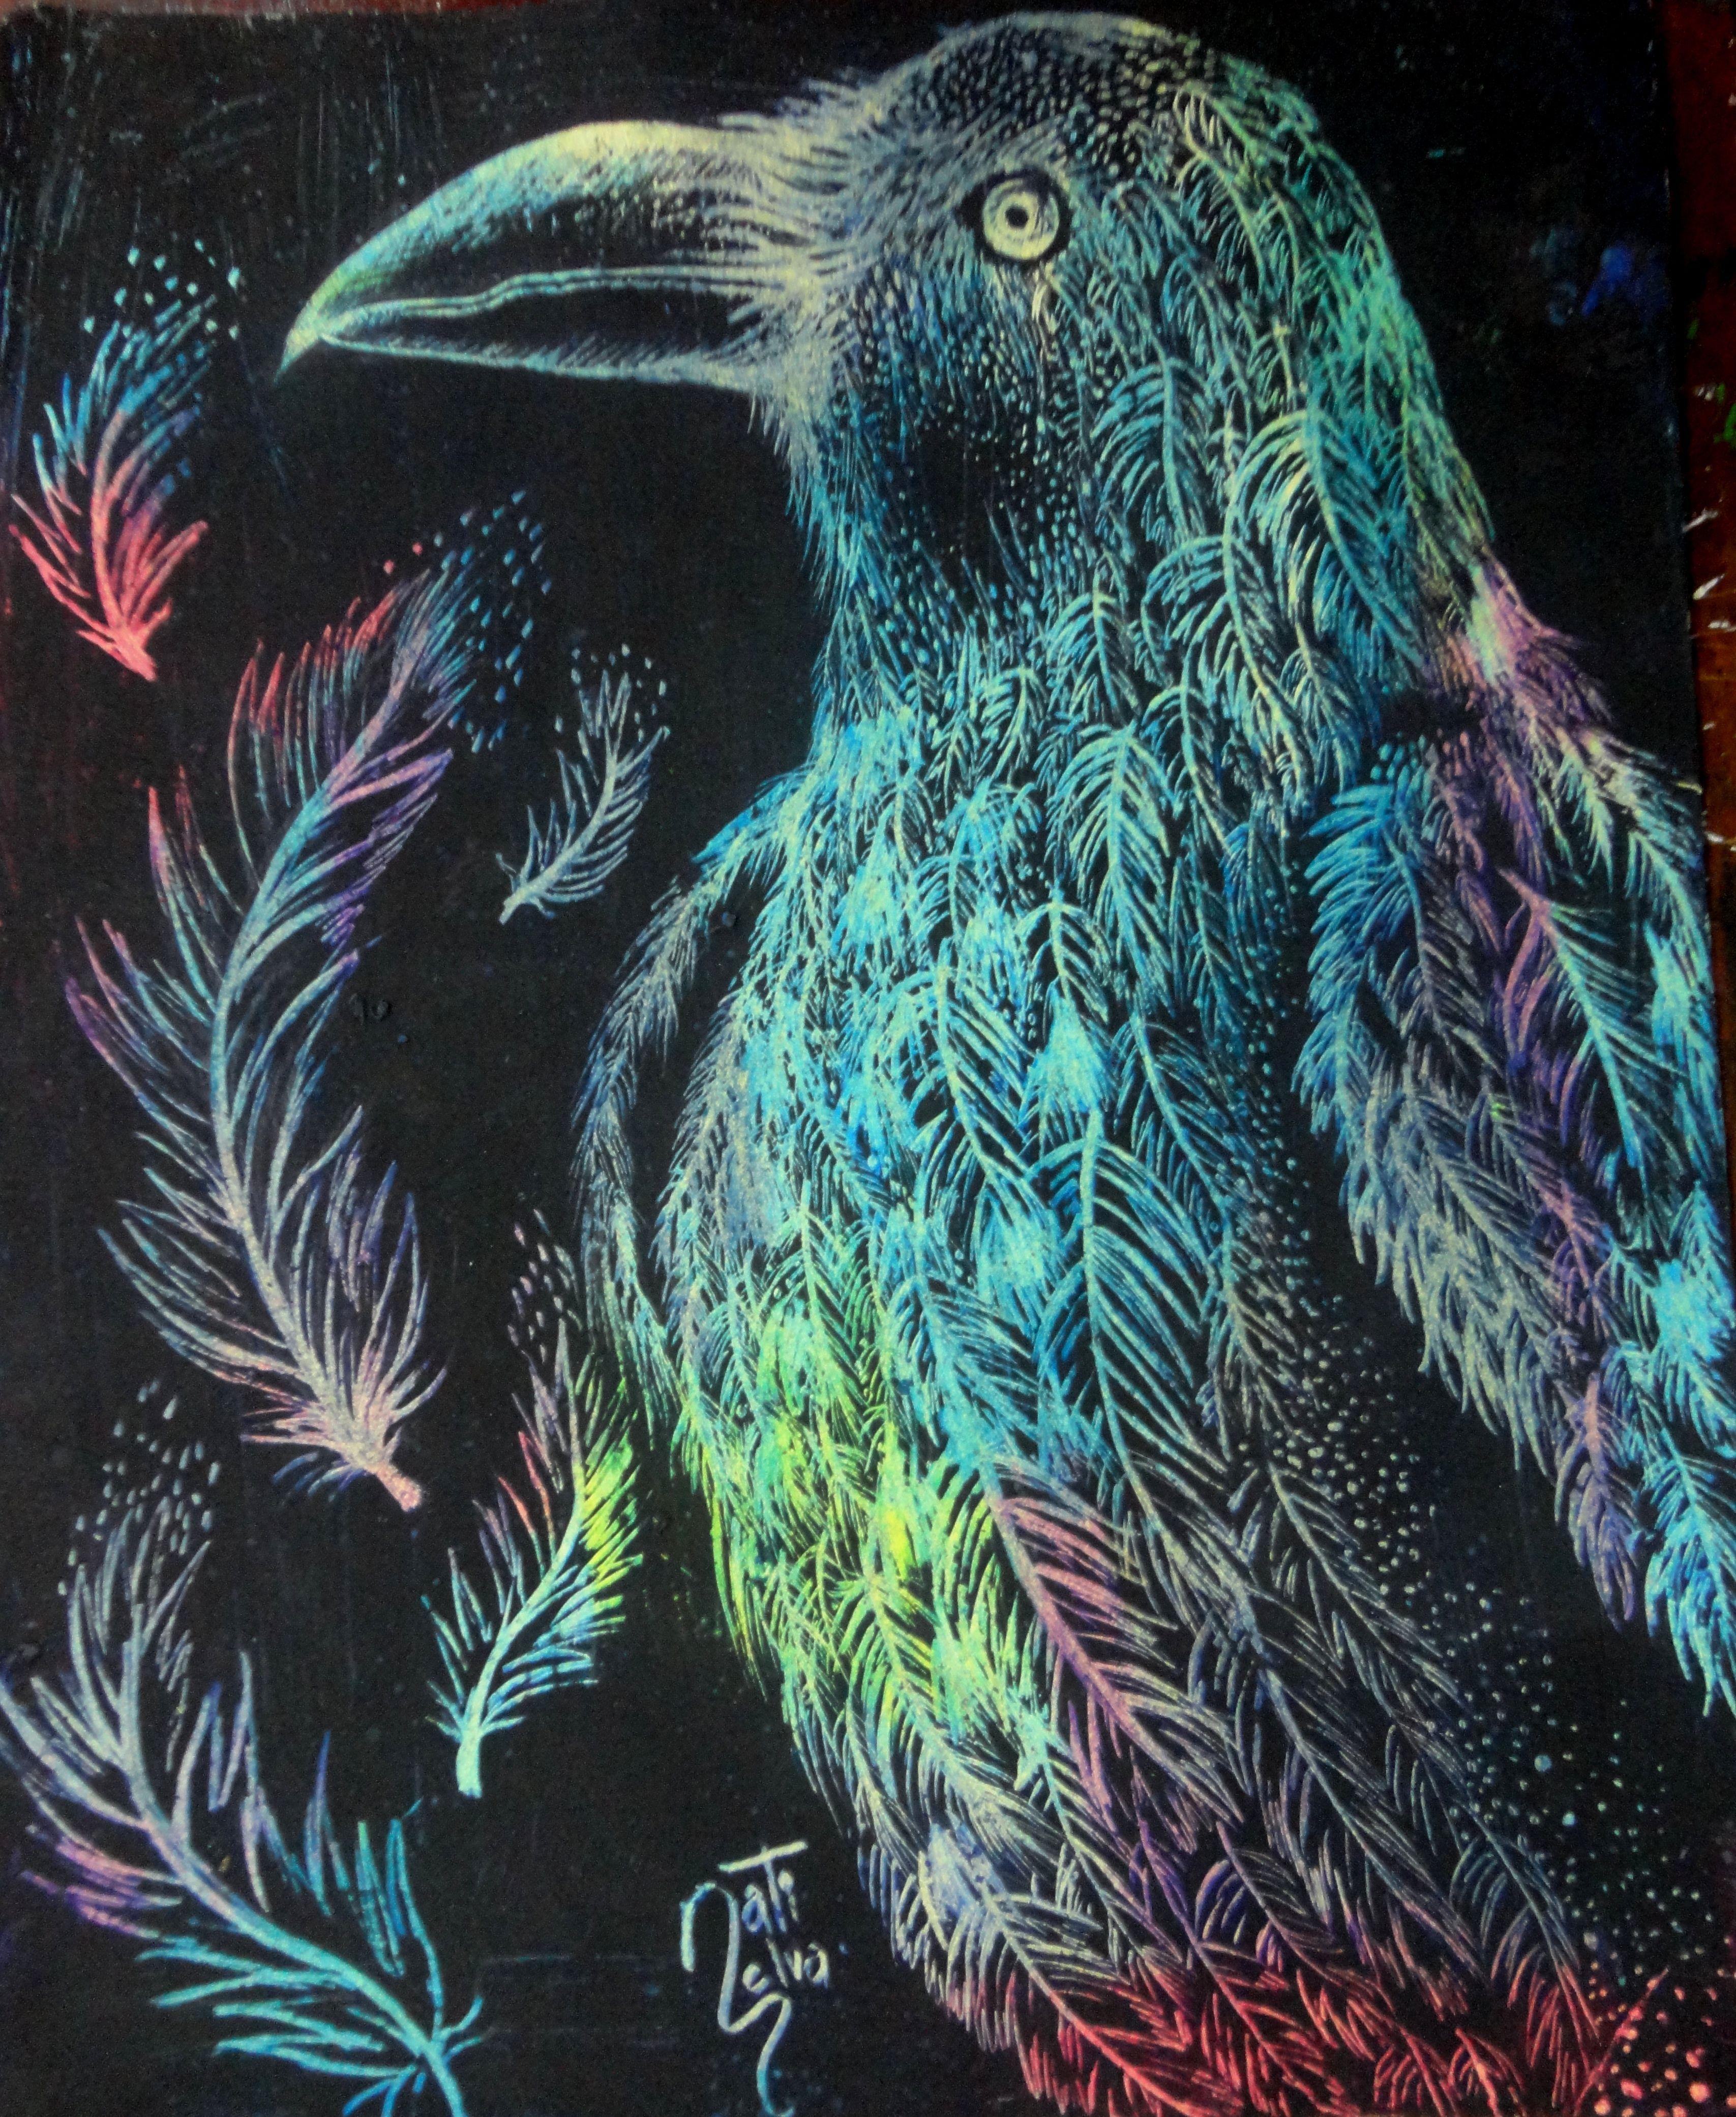 #plumas, #cuervo, #color, #dibujo, #grabado, #mezzo dibujo/ #feathers, #crow, #color, #drawing, #printmaking, #drawing mezzo #raven #coloring #feathers #drawing #ave